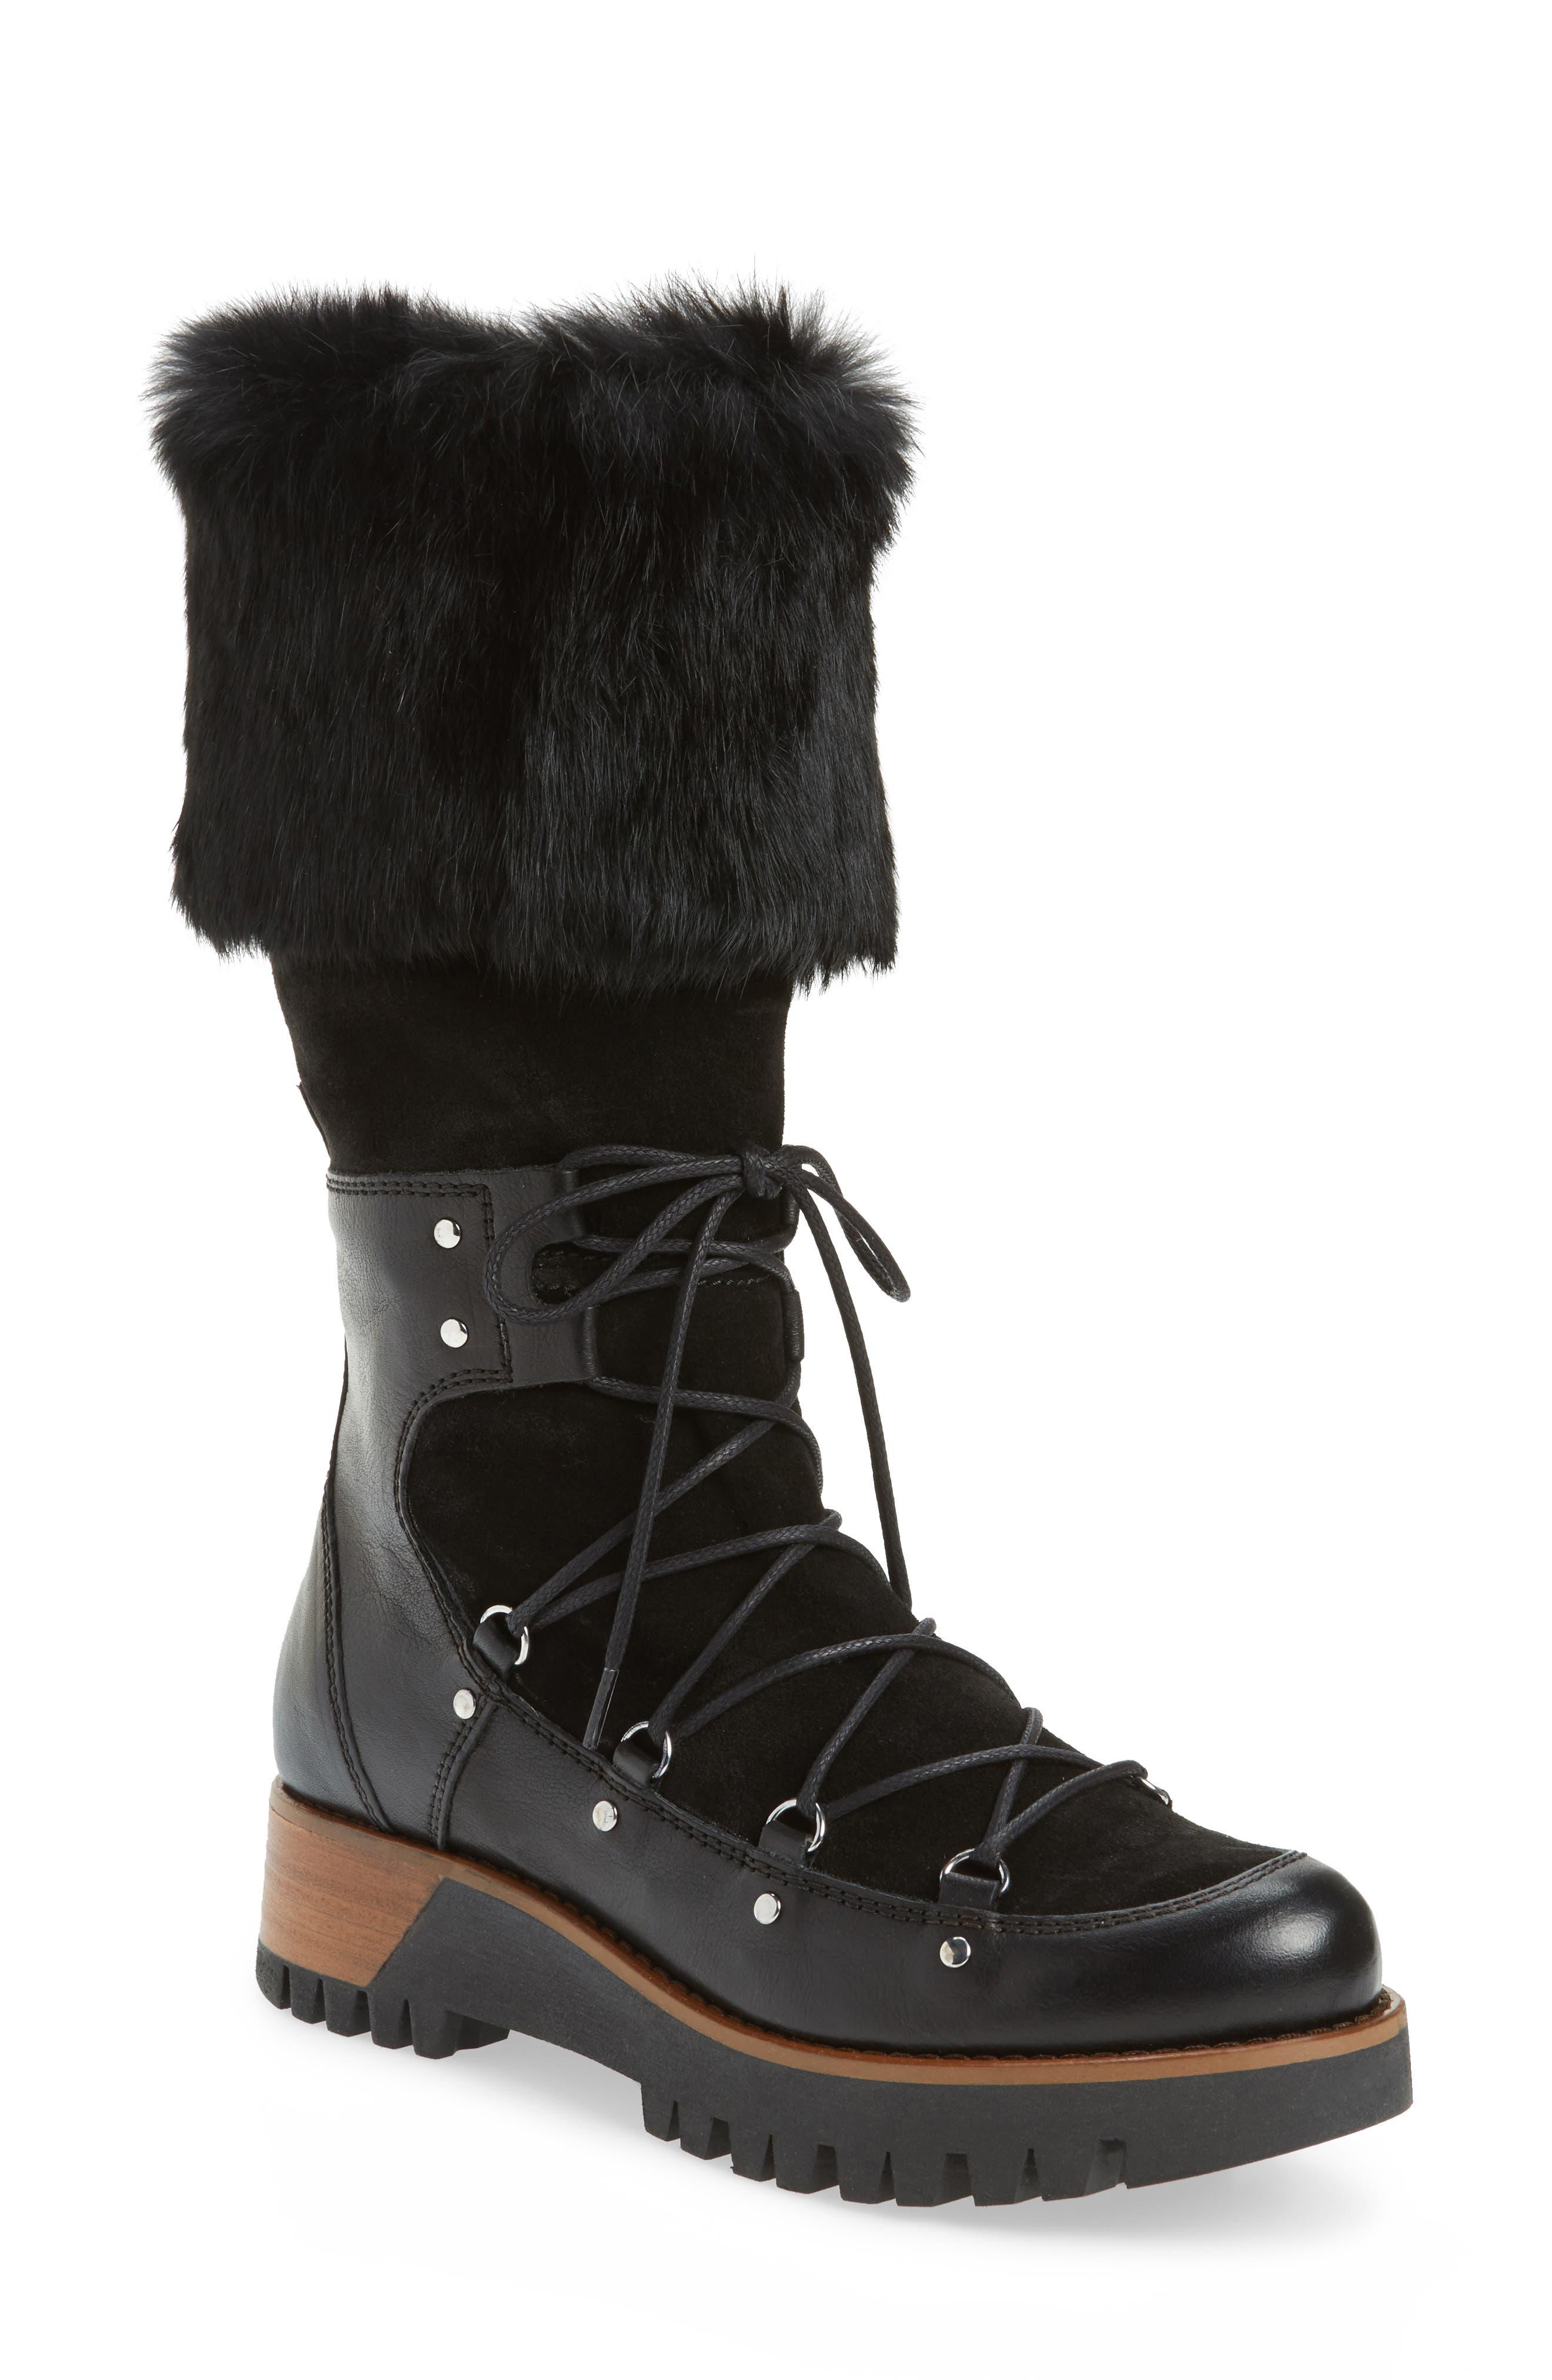 Tellurian Genuine Rabbit Fur Cuff Boot,                         Main,                         color, Black Leather